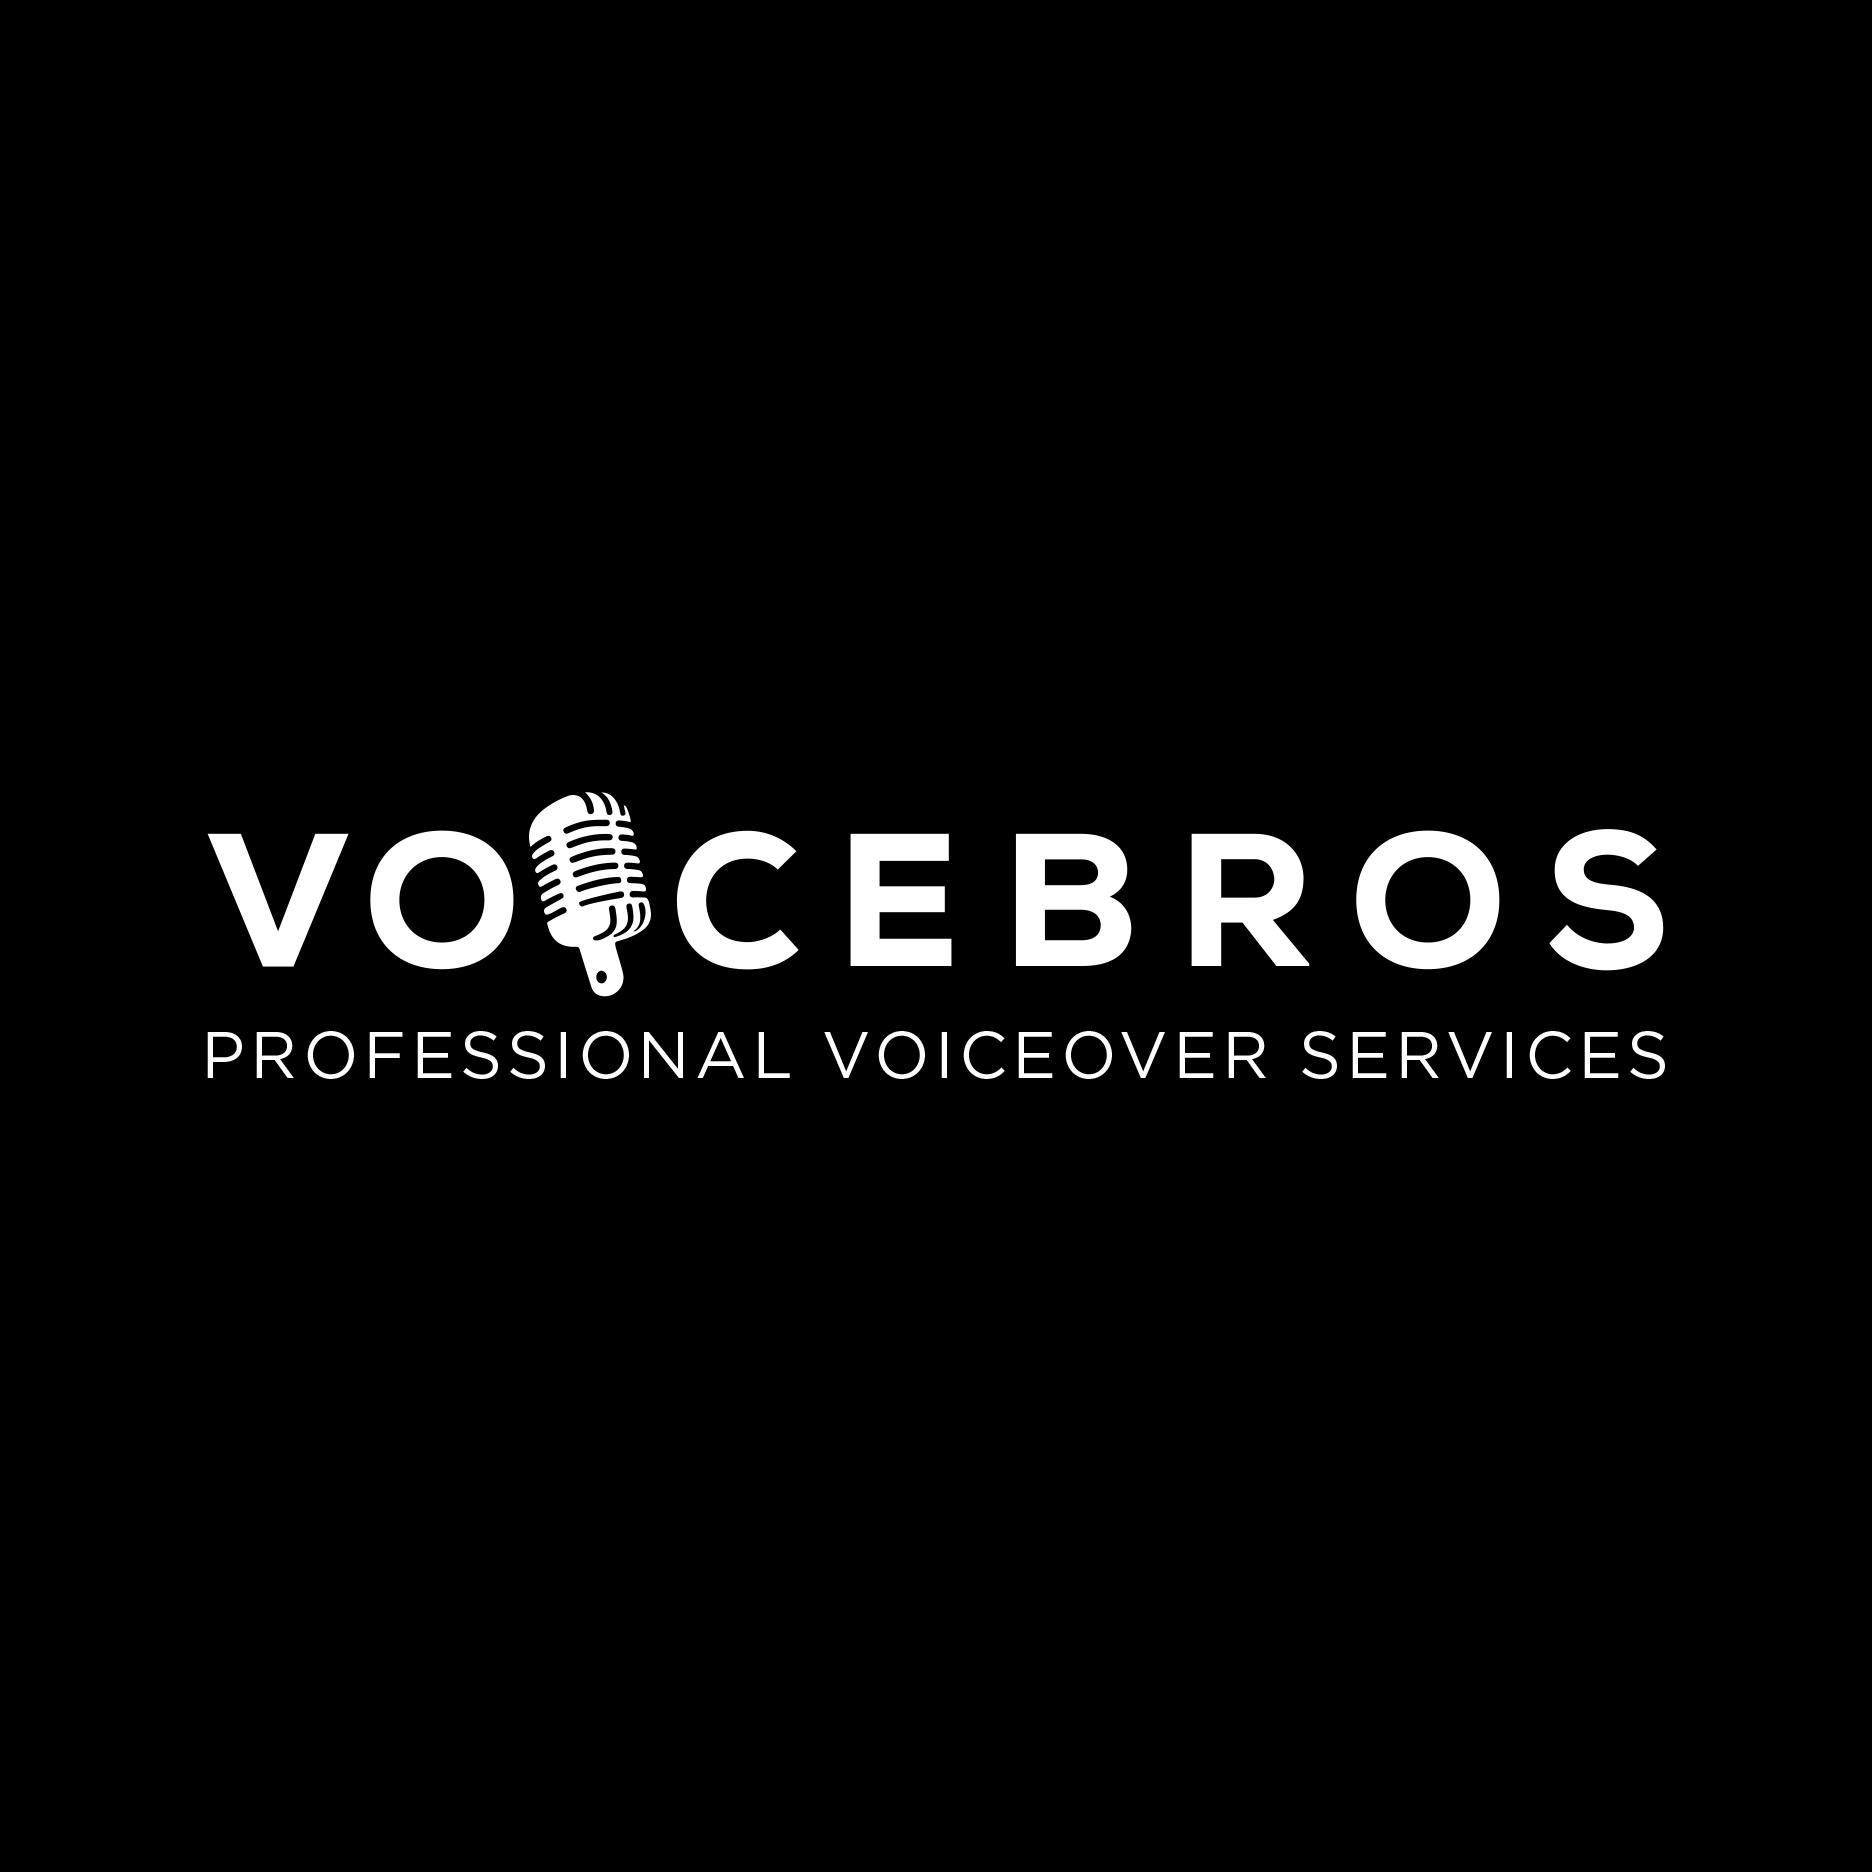 Chiara Tixi is a voice over actor